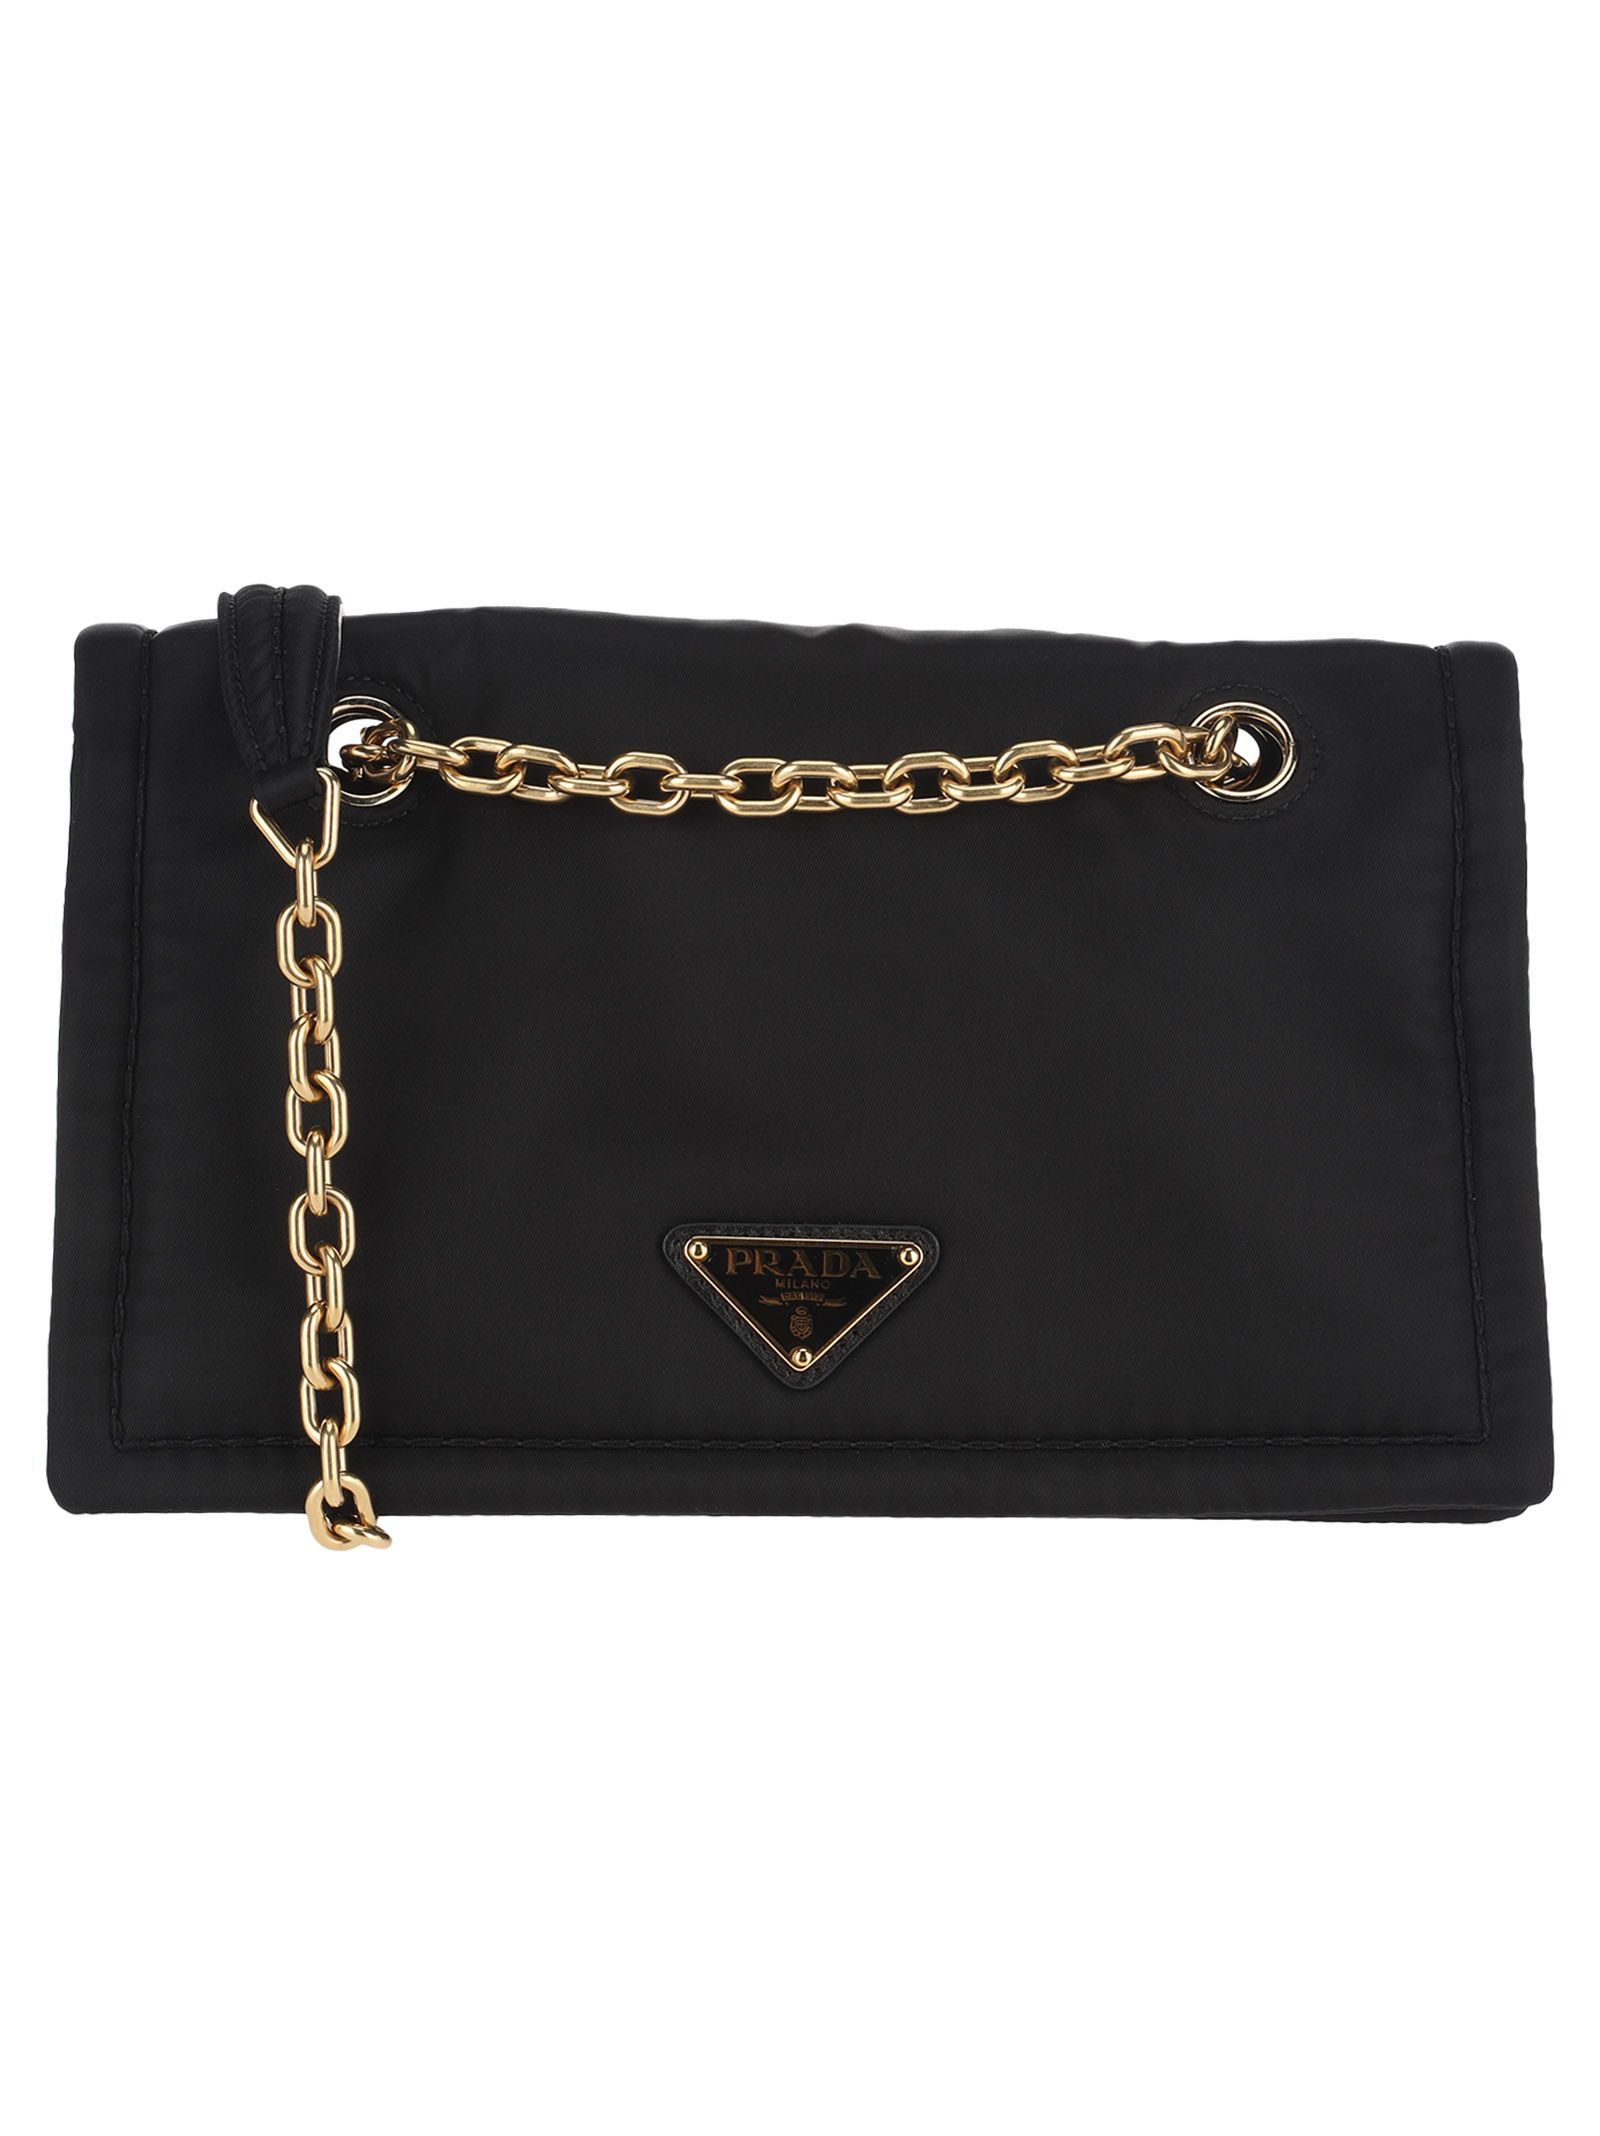 bc4dac082b34fd Prada Prada Nylon Shoulder Bag - BLACK - 10967228   italist